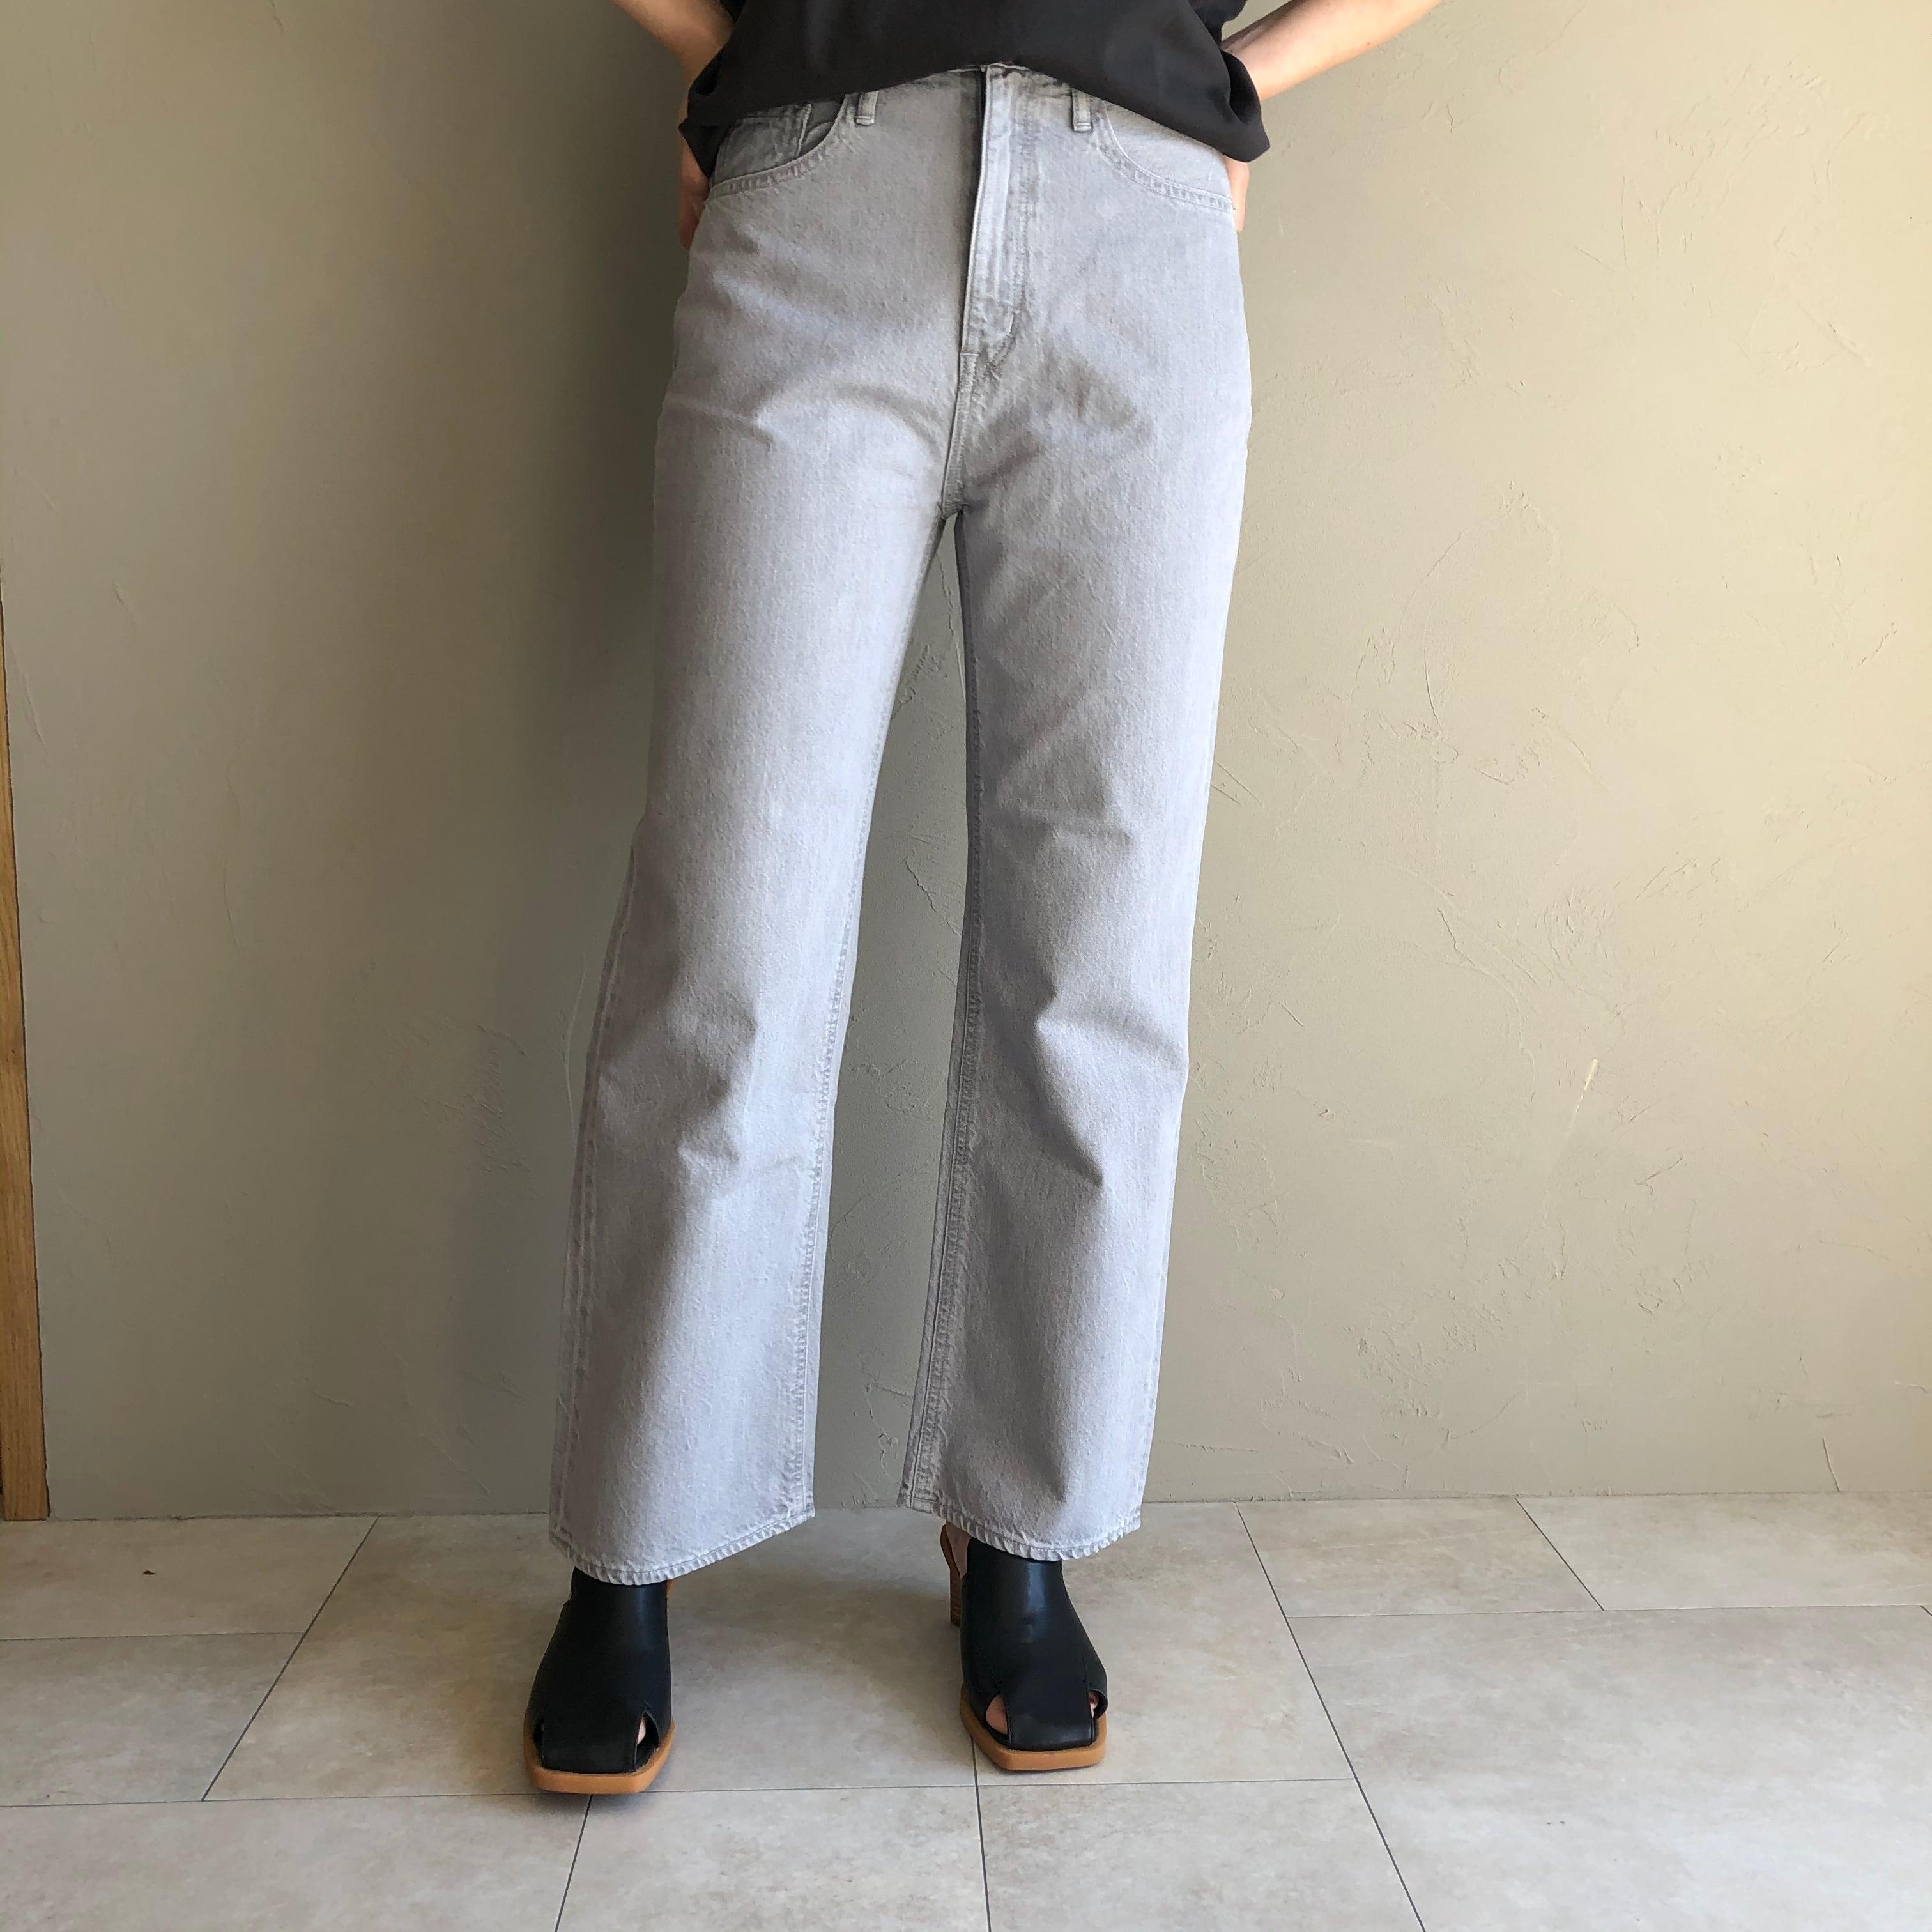 【 ANTGAUGE 】- C1878 - 5P ストレートジーンズ